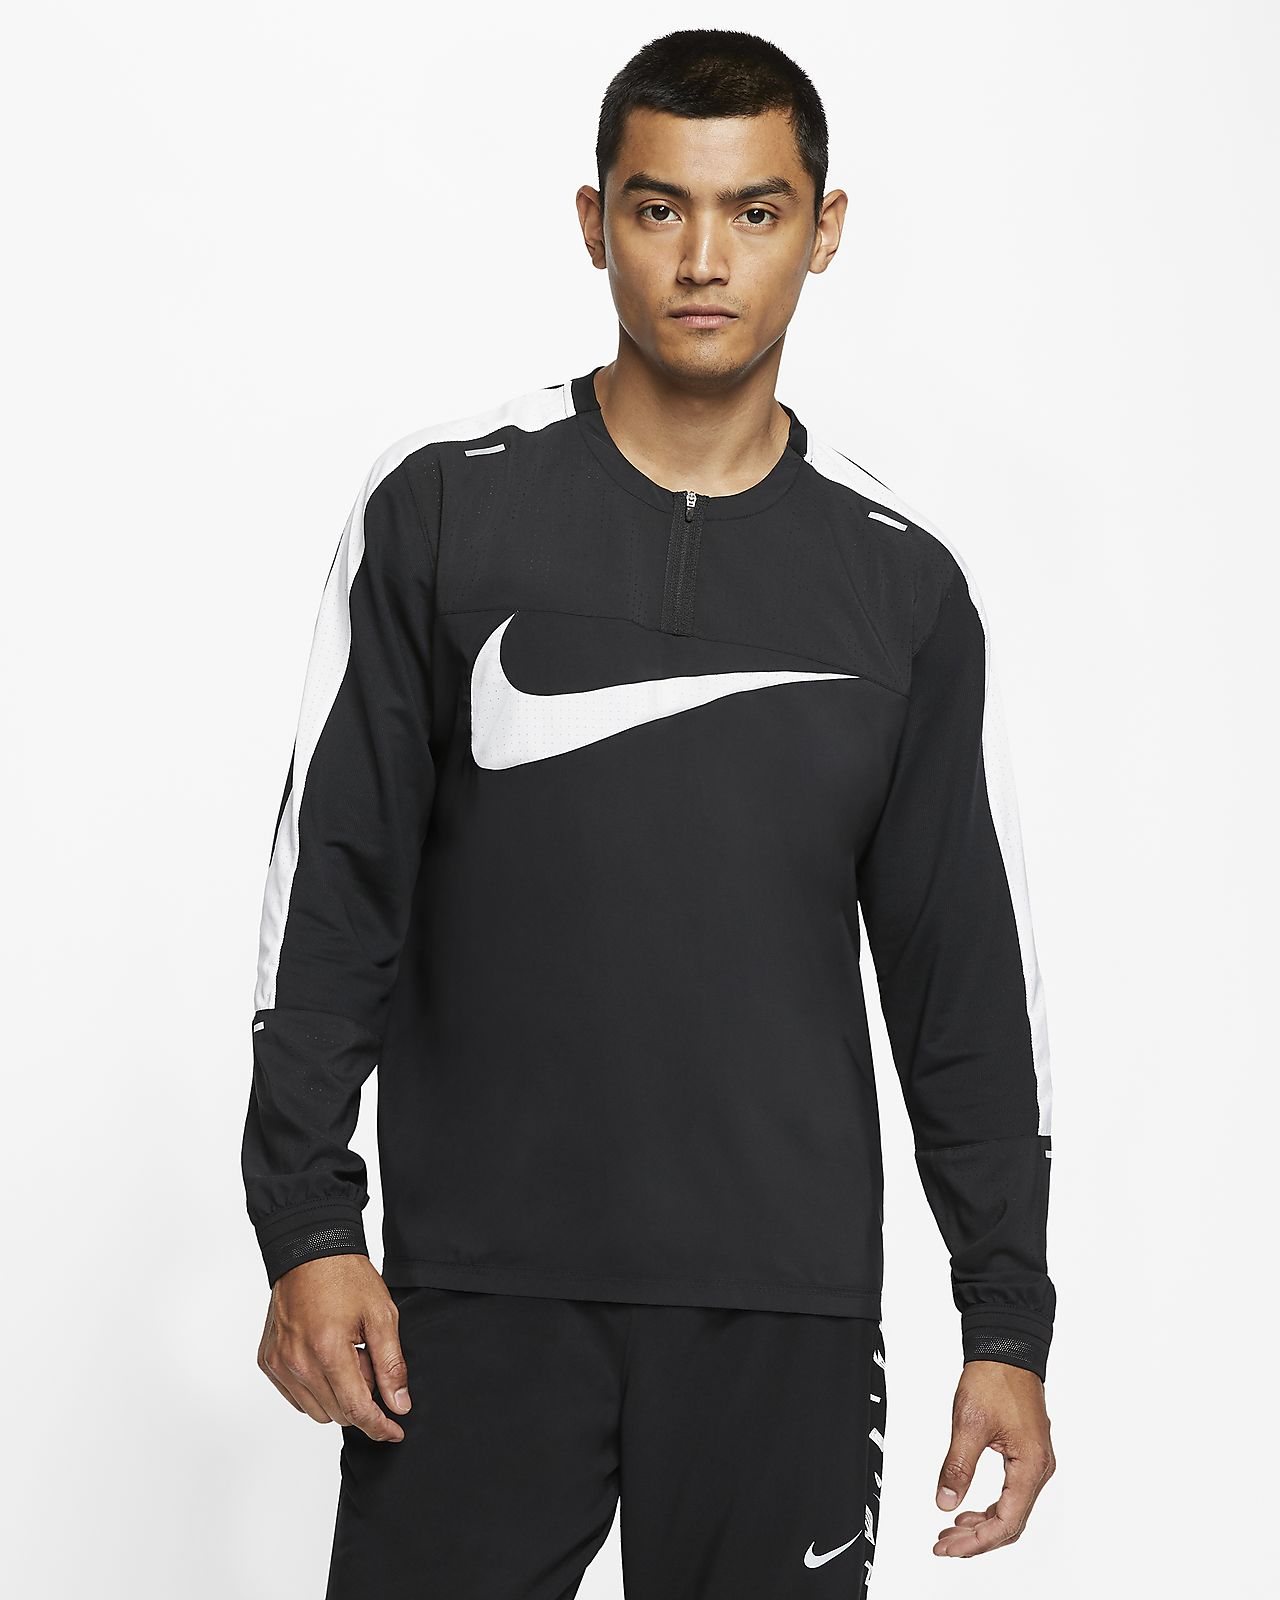 Haut de running à 1/4 de zip Nike Wild Run pour Homme